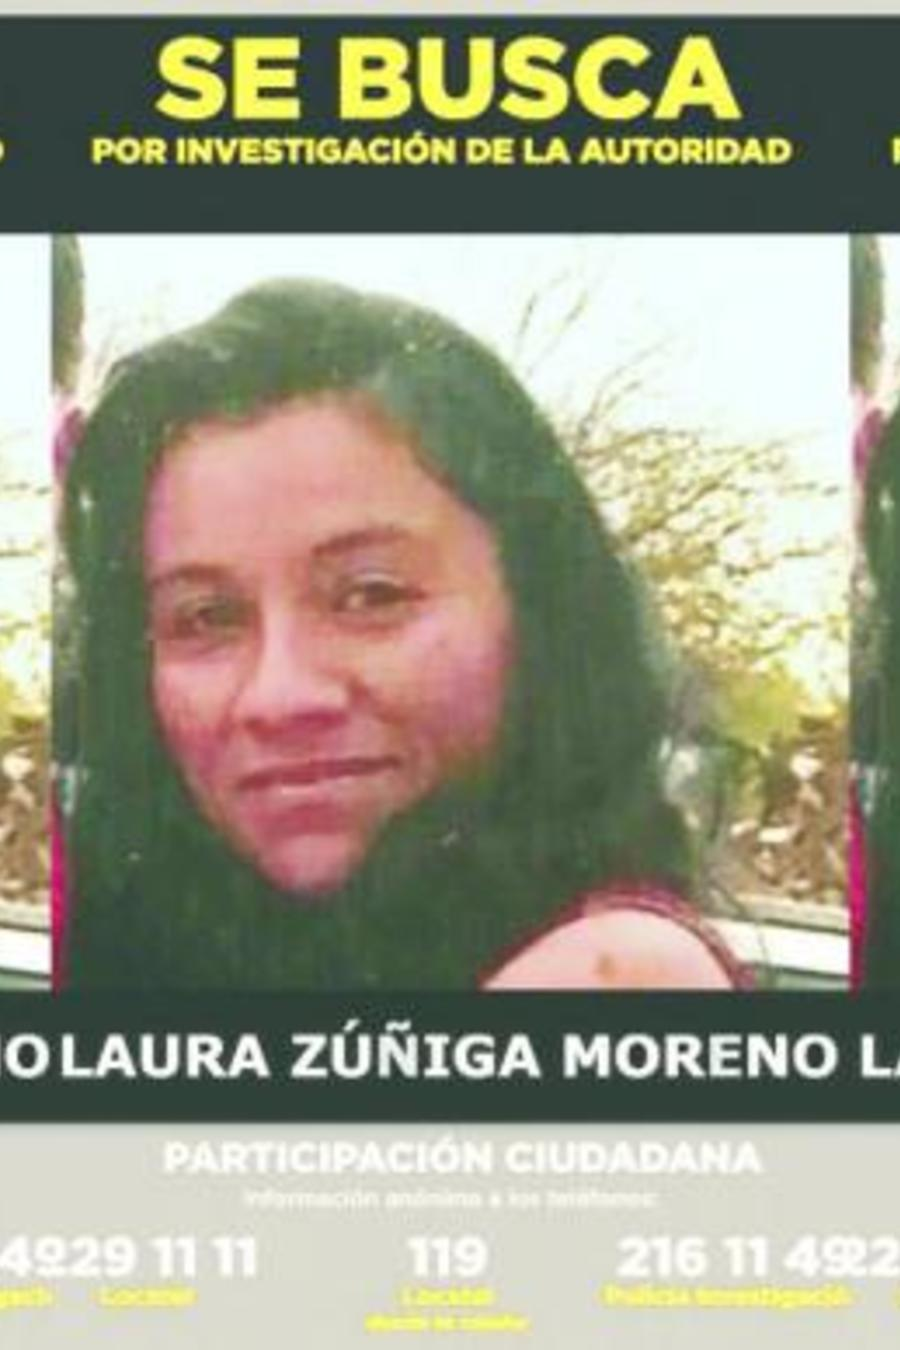 Laura Zúñiga Moreno